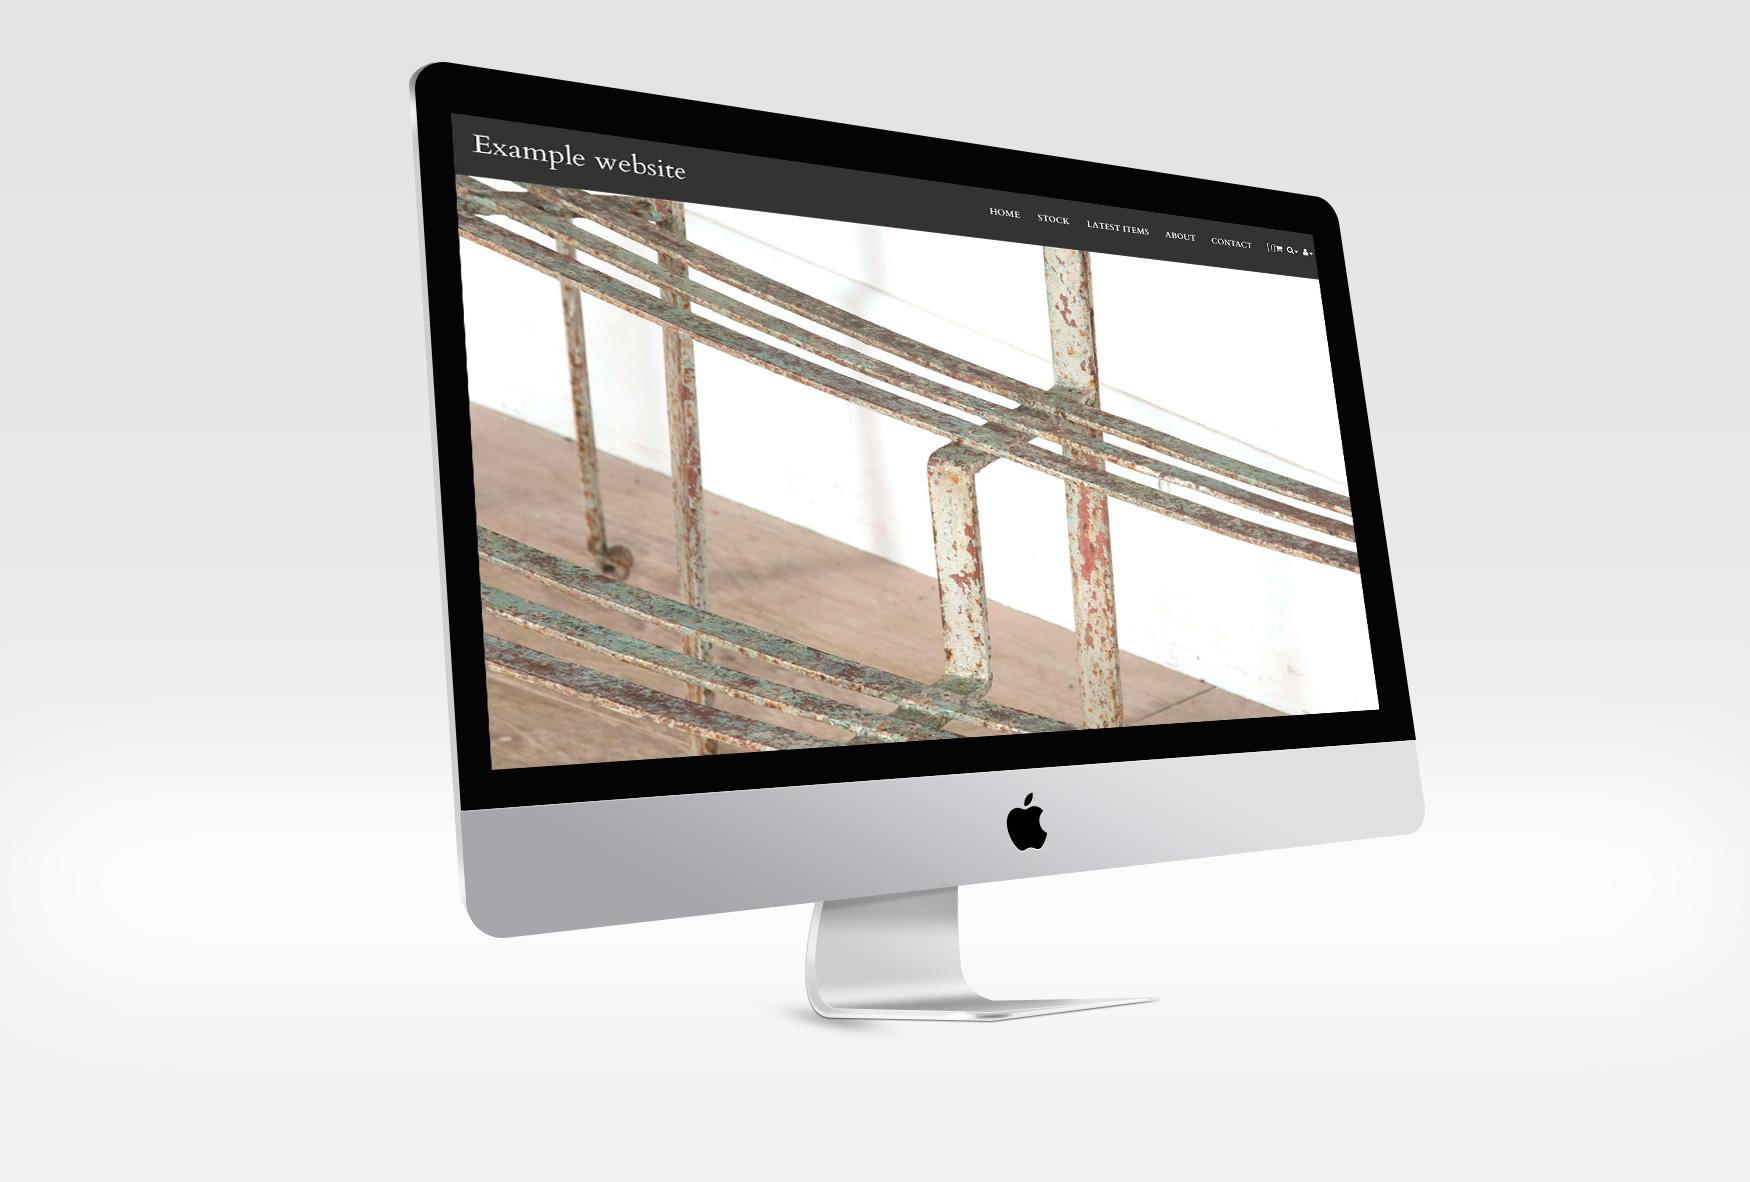 Carsington home page on an iMac